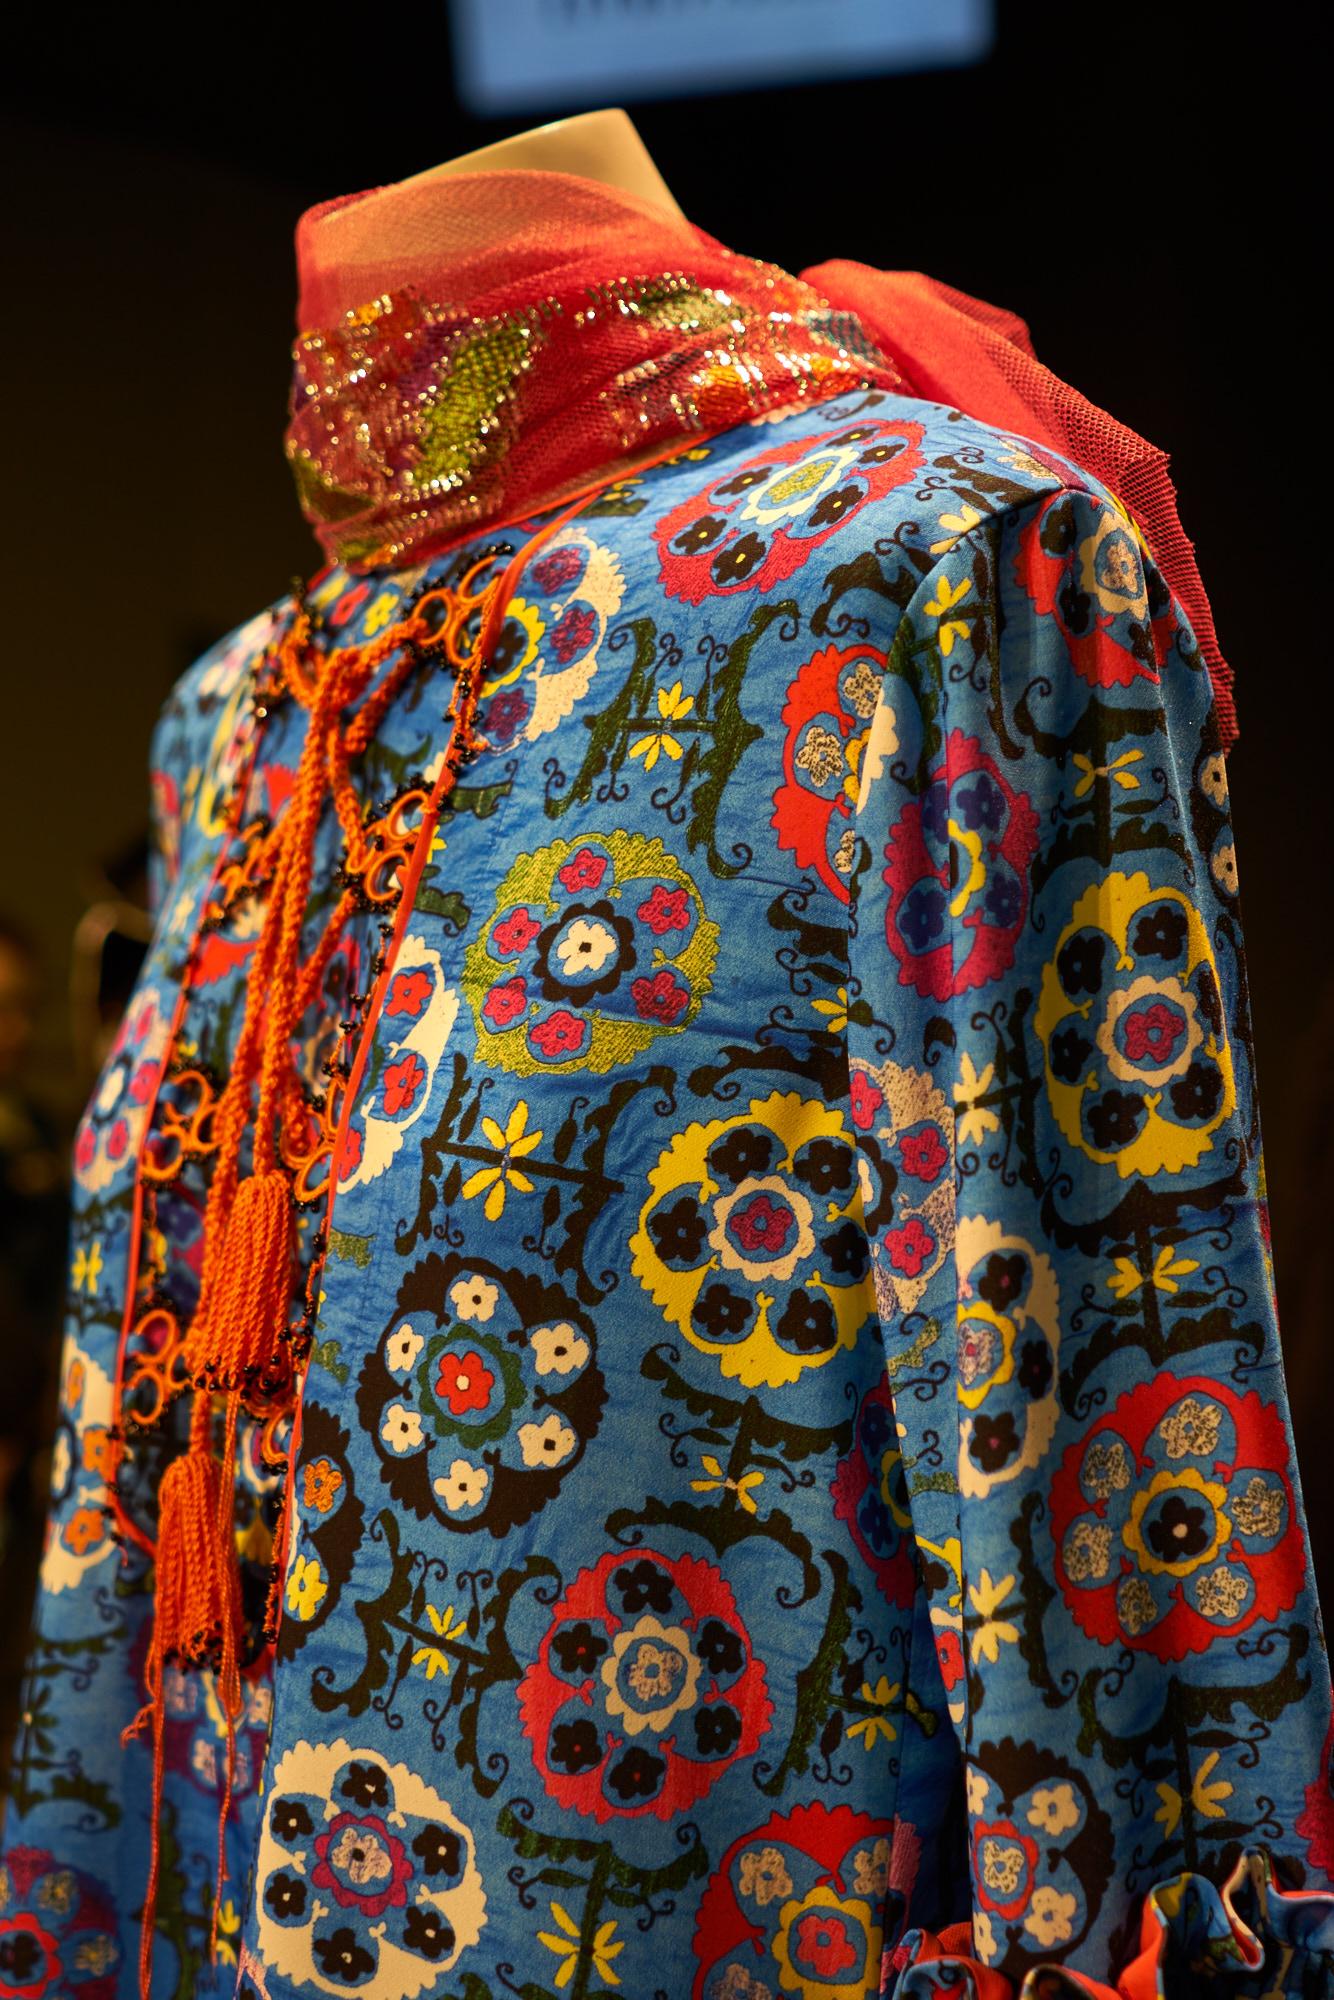 billur saatci, street style, mbfwi, off ne giysem, turkish style blogger, mercedes-benz fashion week istanbul, zeynep tosun,